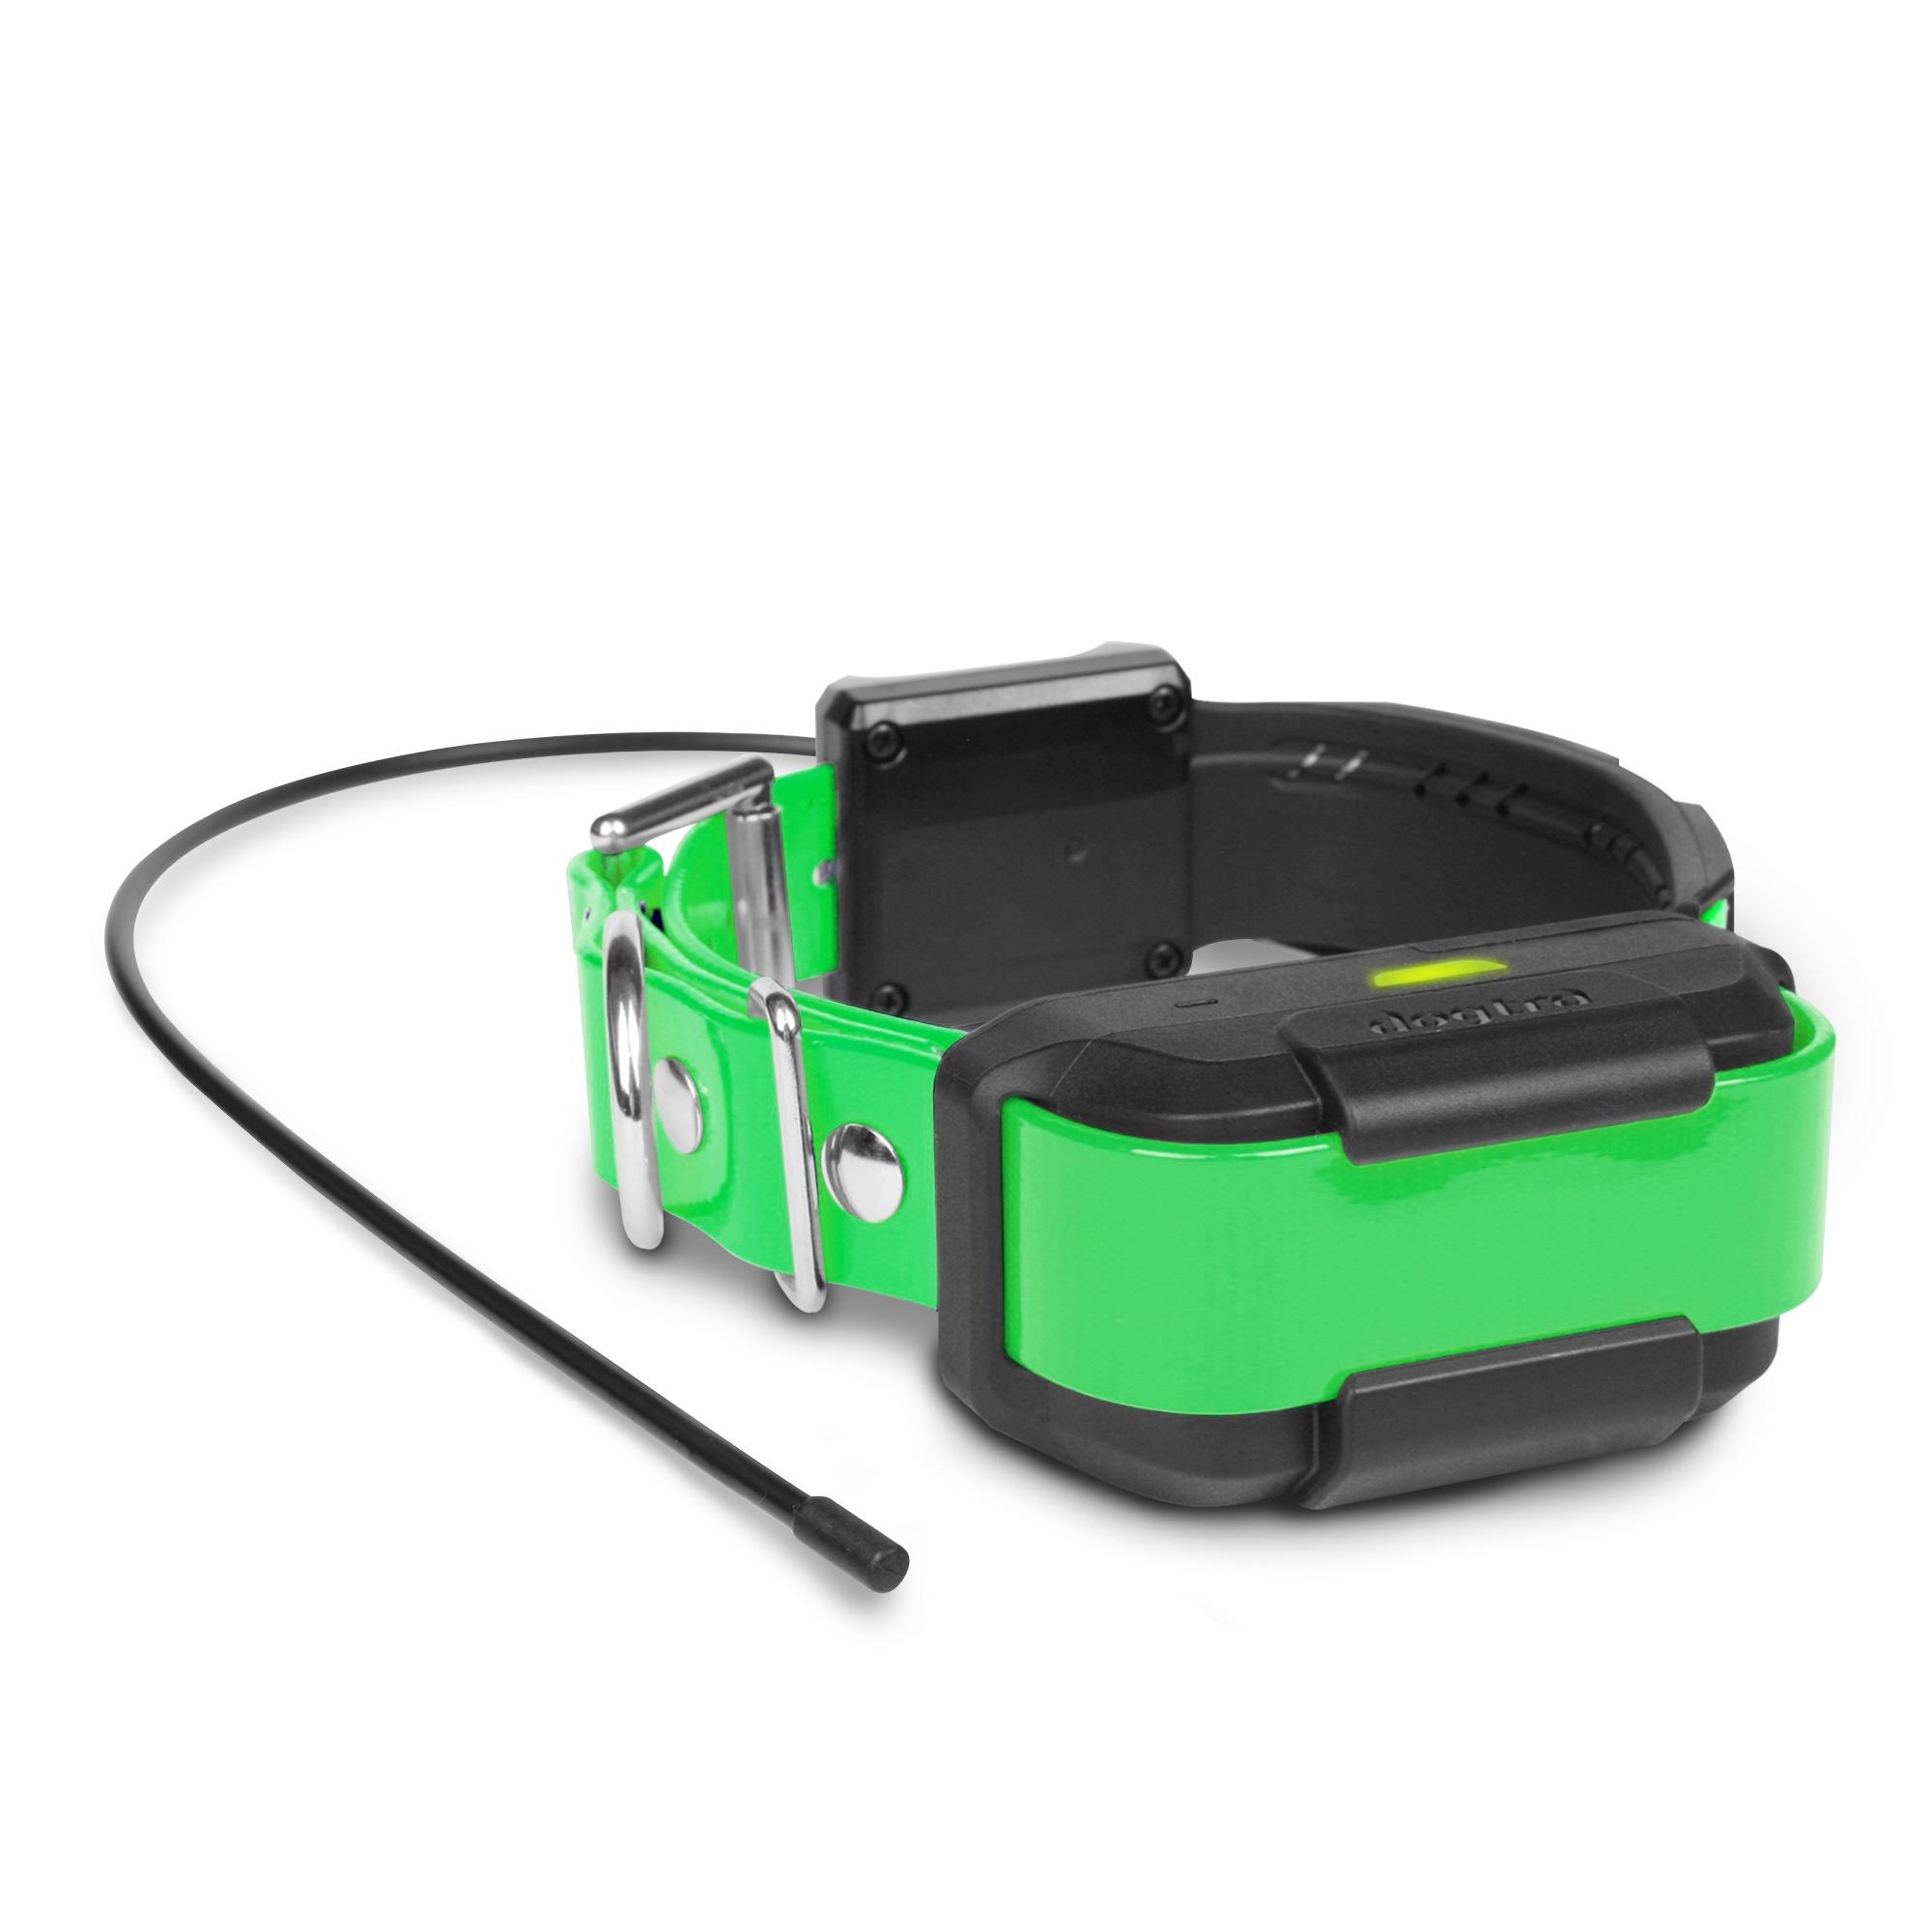 Dogtra Edge Remote Training  Extra Shock Collar Receiver 1 MILE RANGE Green